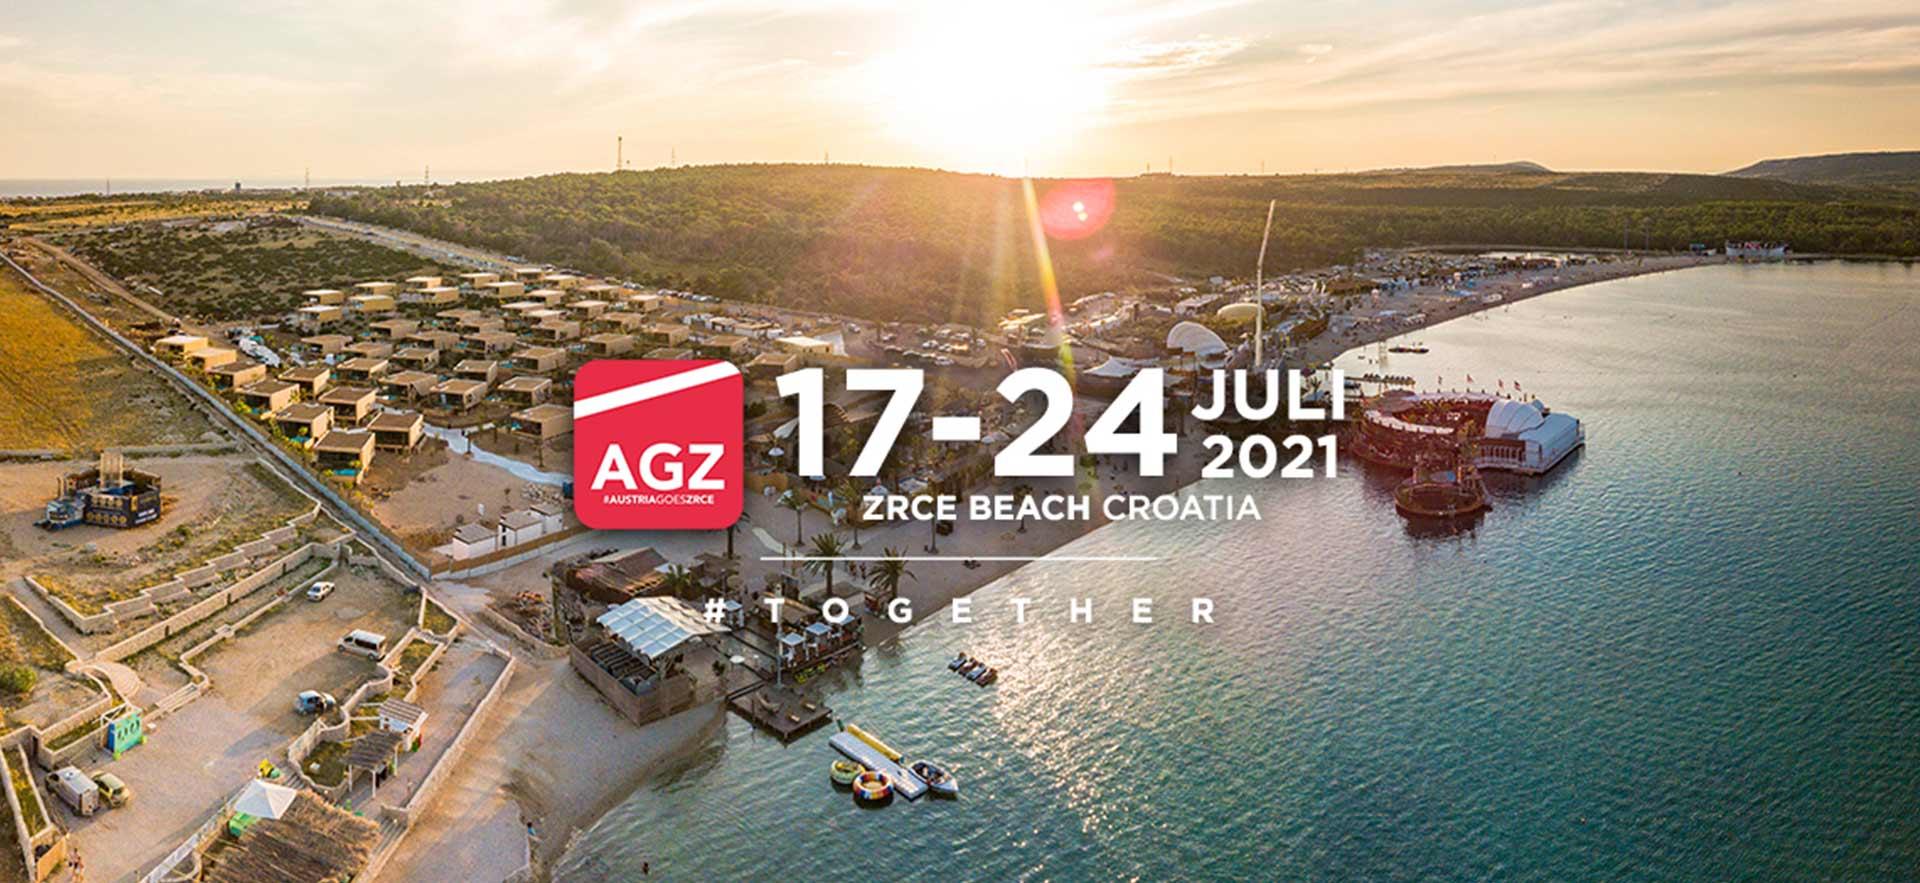 Austria goes Zrce 2021